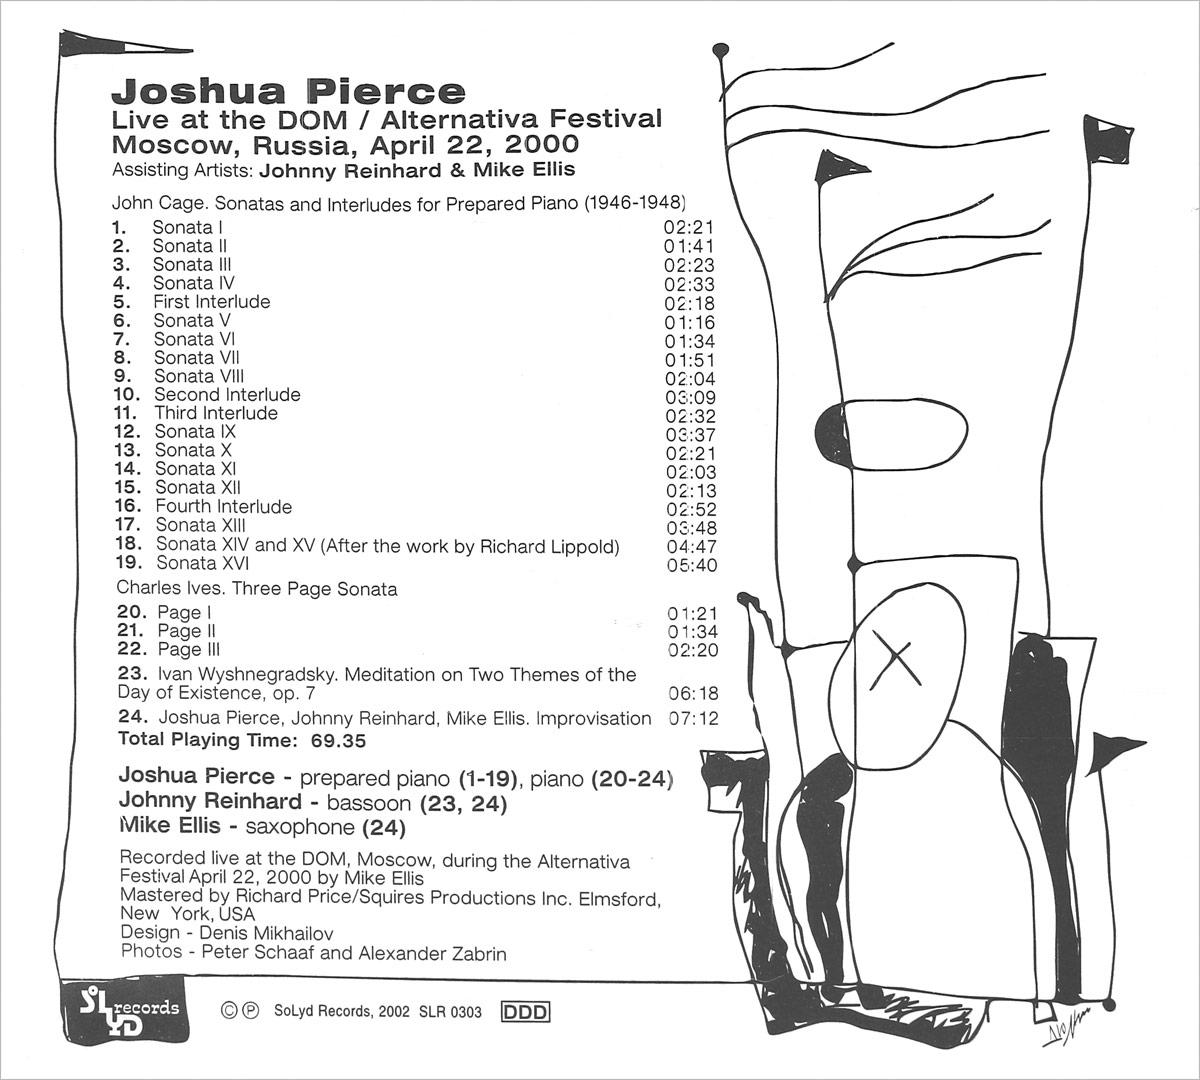 Joshua Pierce.  Live At The DOM / Alternativa Festival April 22, 2000 SoLyd Records